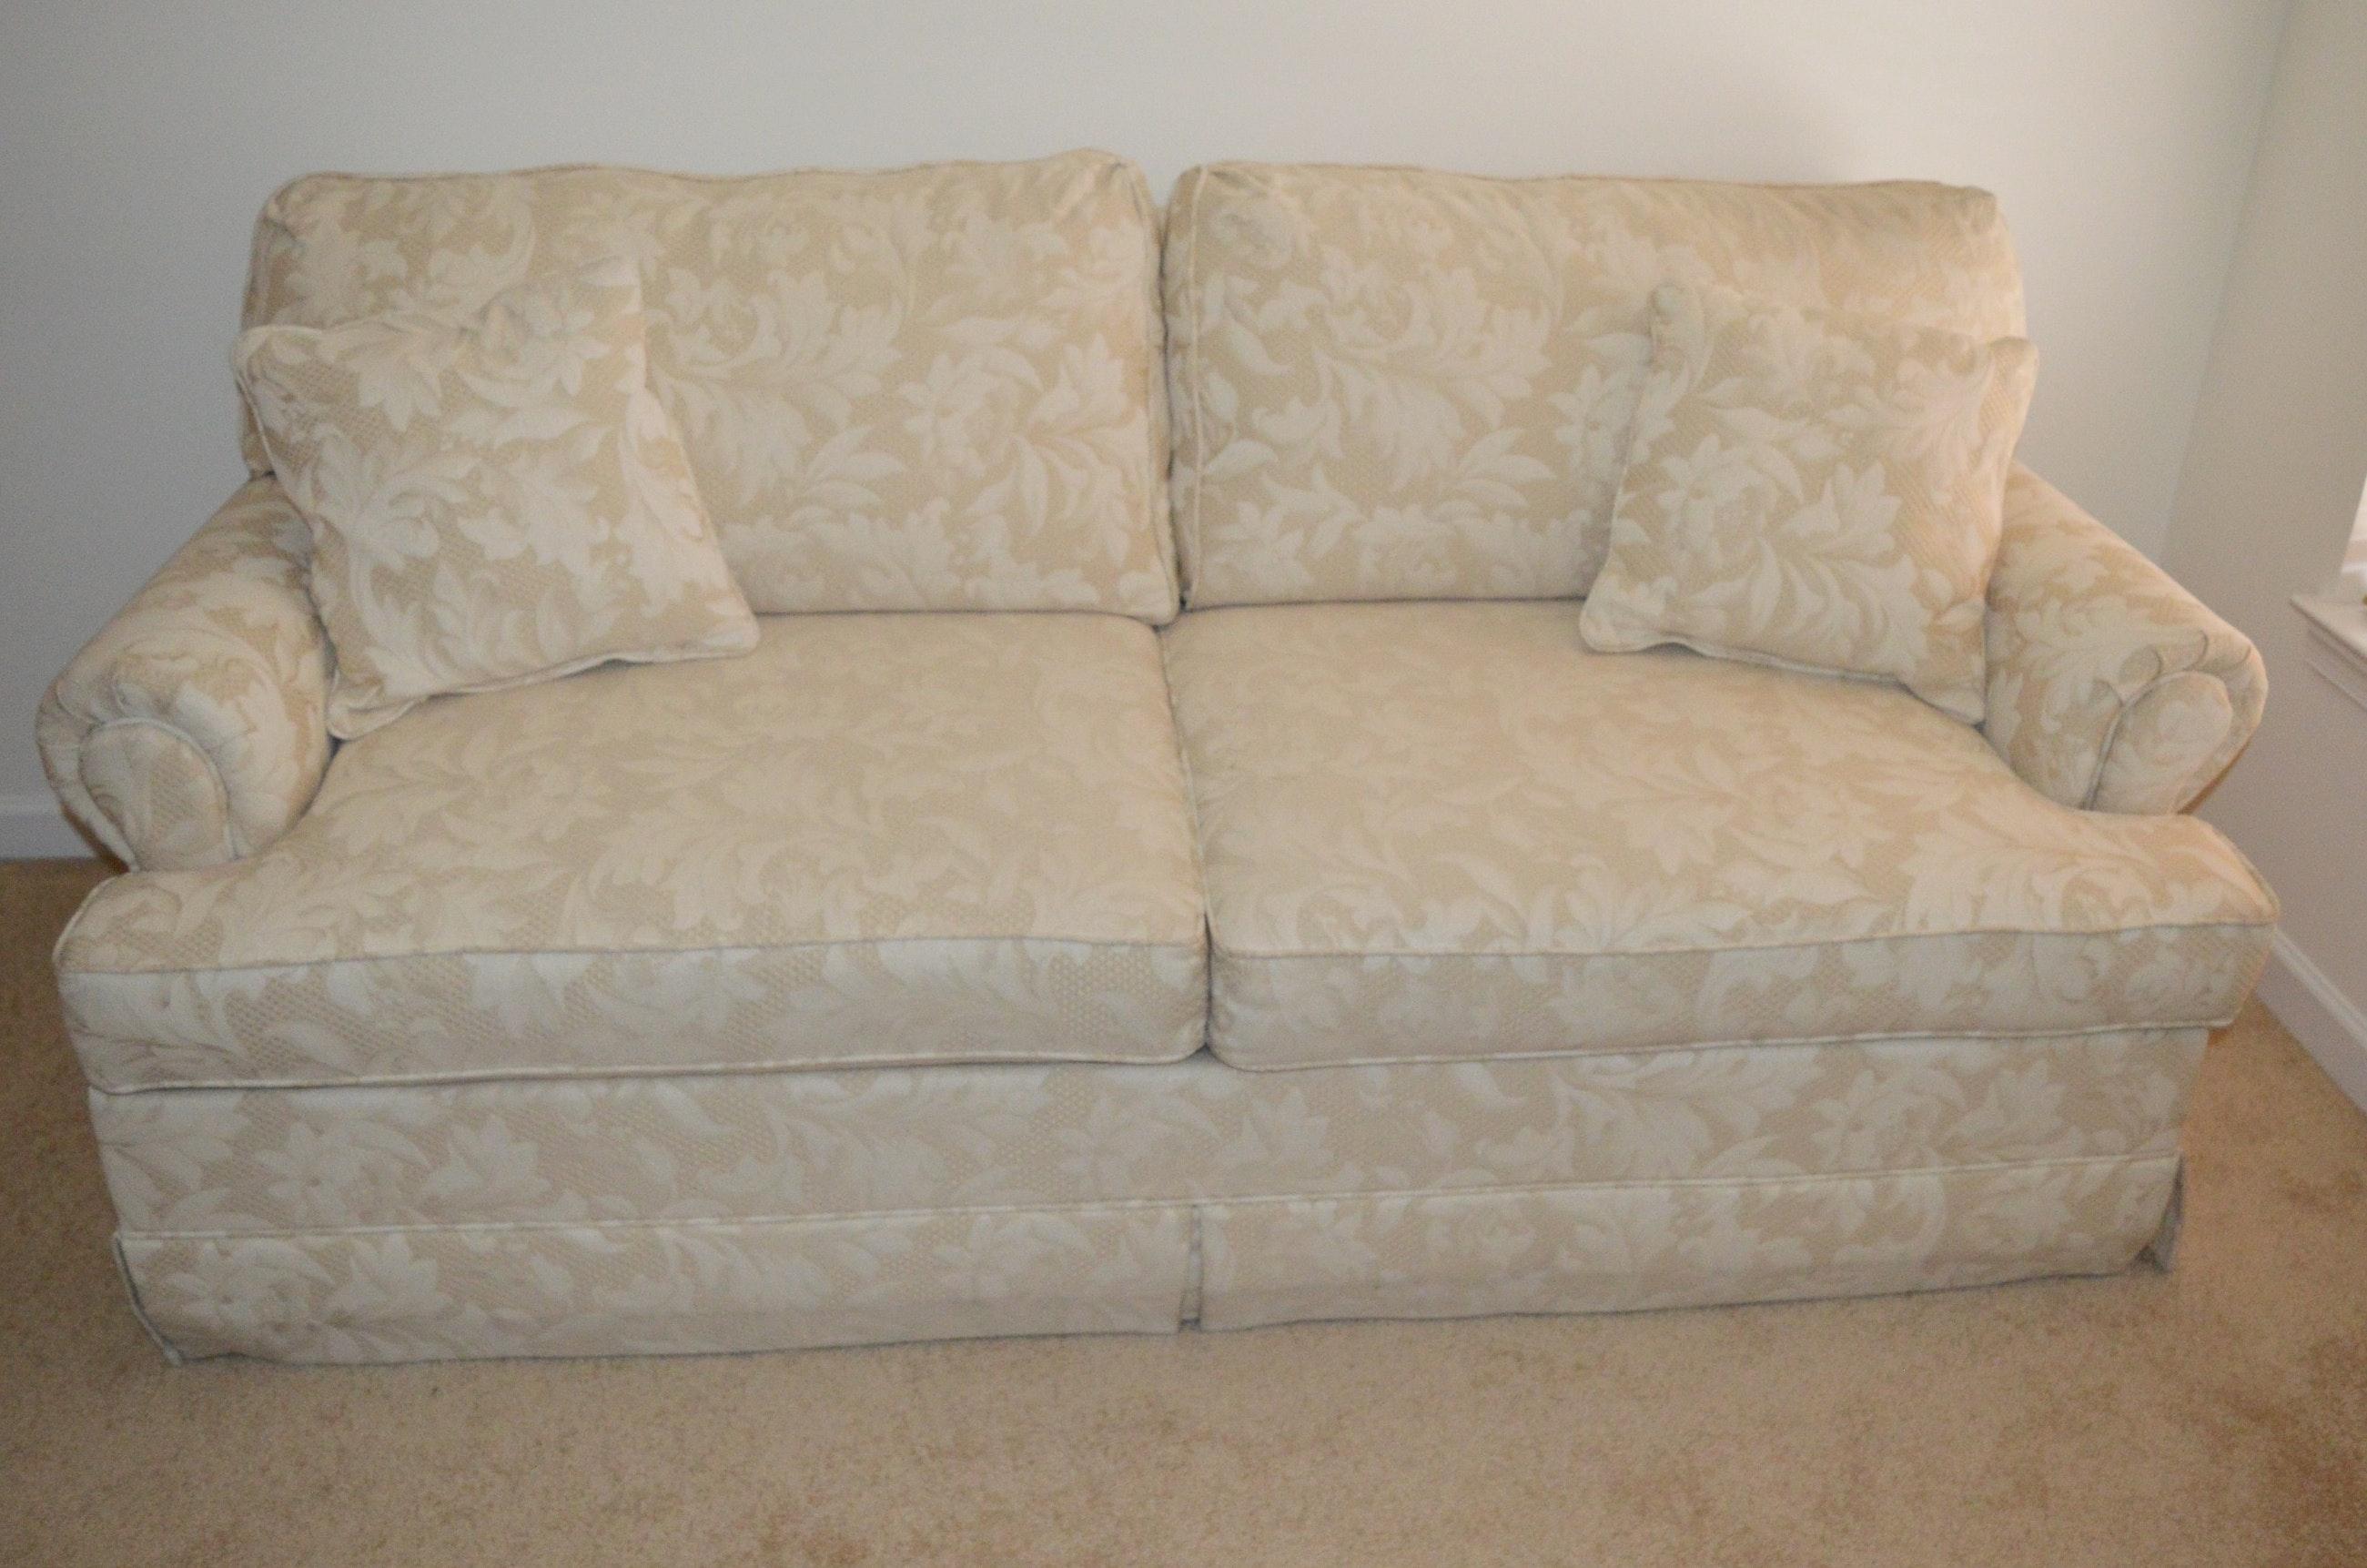 Sofa Express Sleeper Sofa with Sealy Mattress